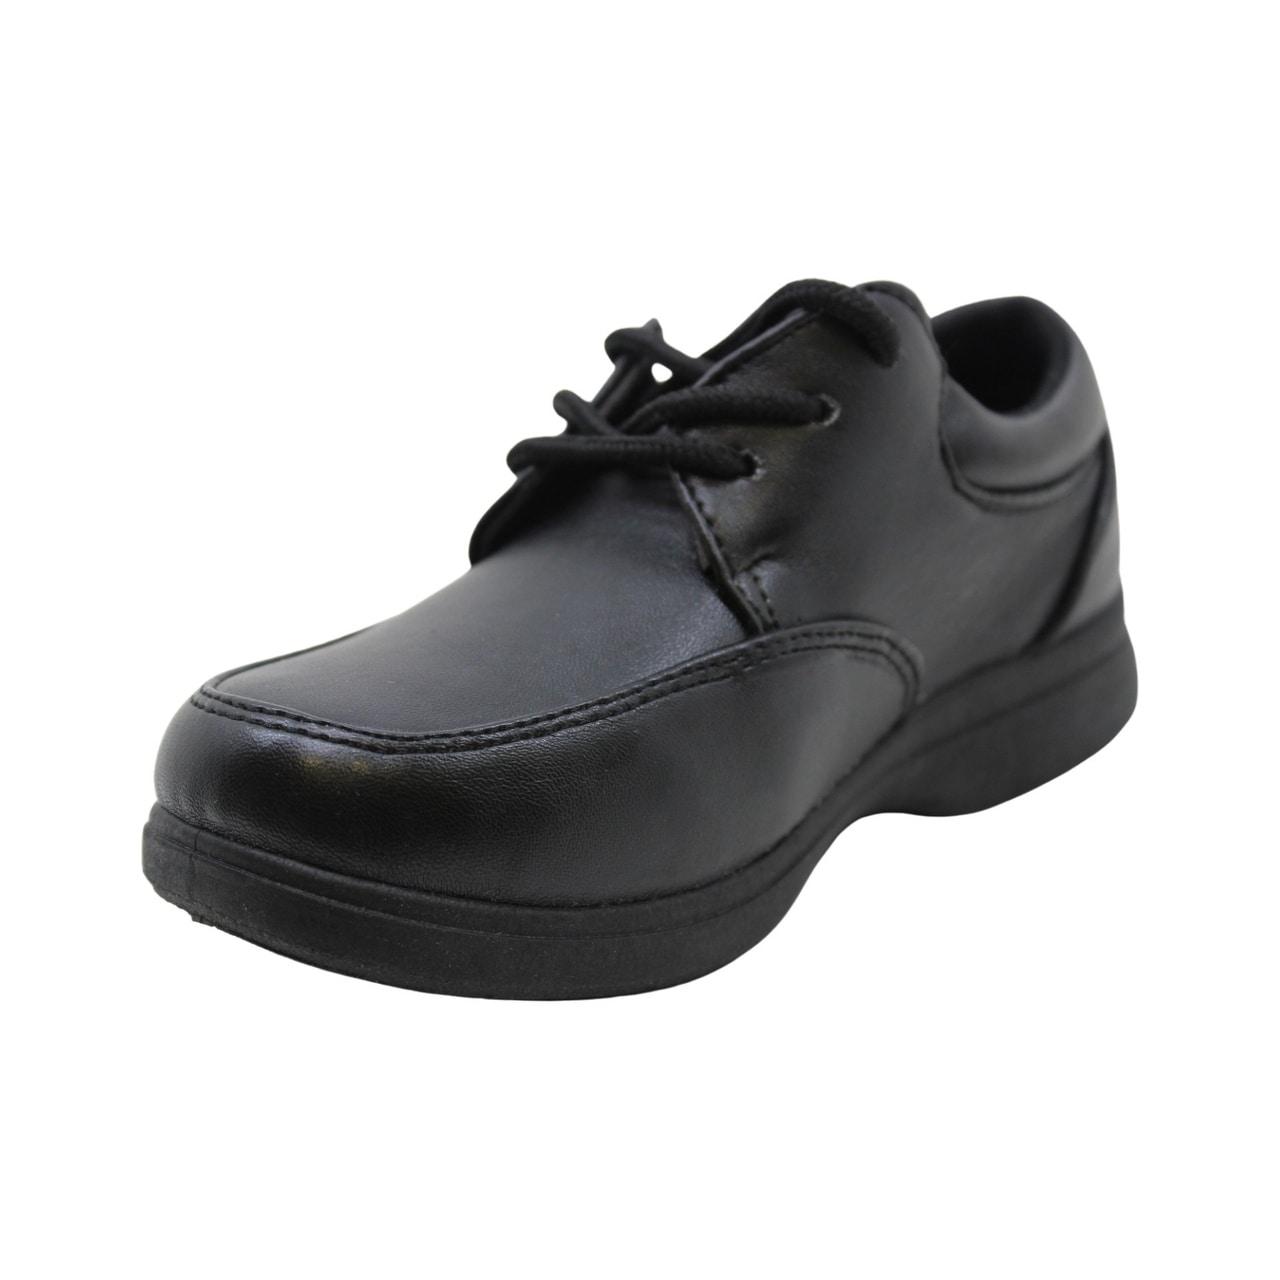 Hawkwell Boys School Uniform Dress Shoe Little Kid 13 M US Black PU